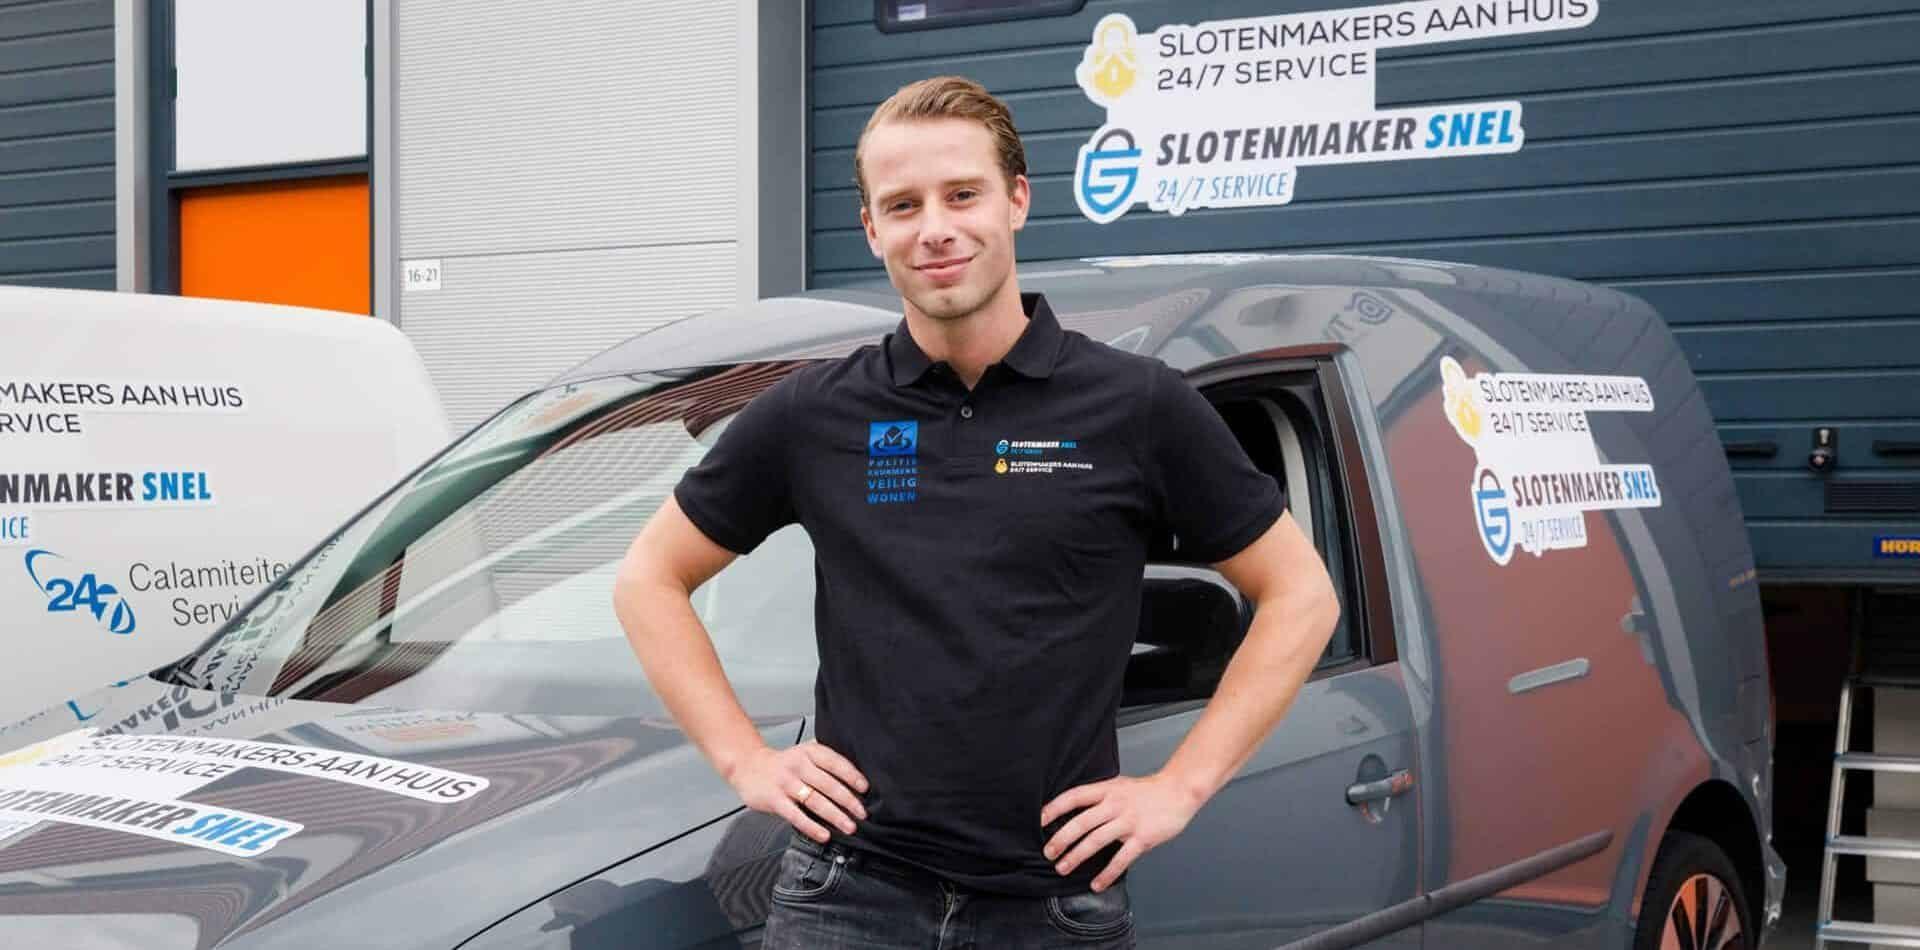 Slotenmaker Landsmeer (6)